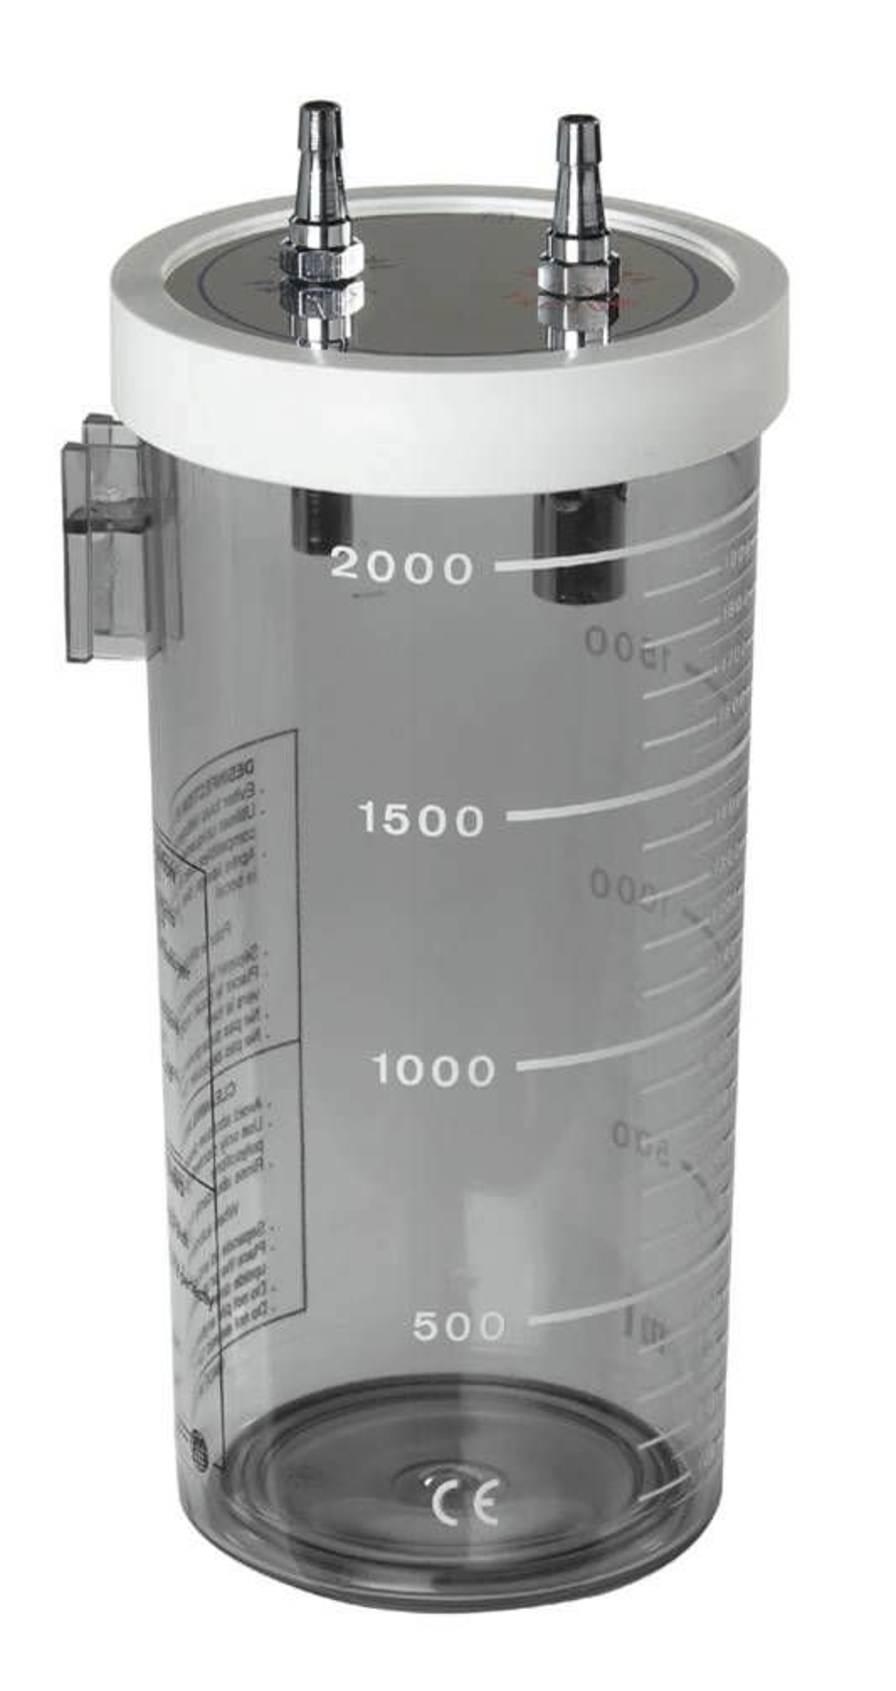 Medical suction pump jar / polycarbonate / suction polysulfonate 2 L | TM B03 Technologie Medicale